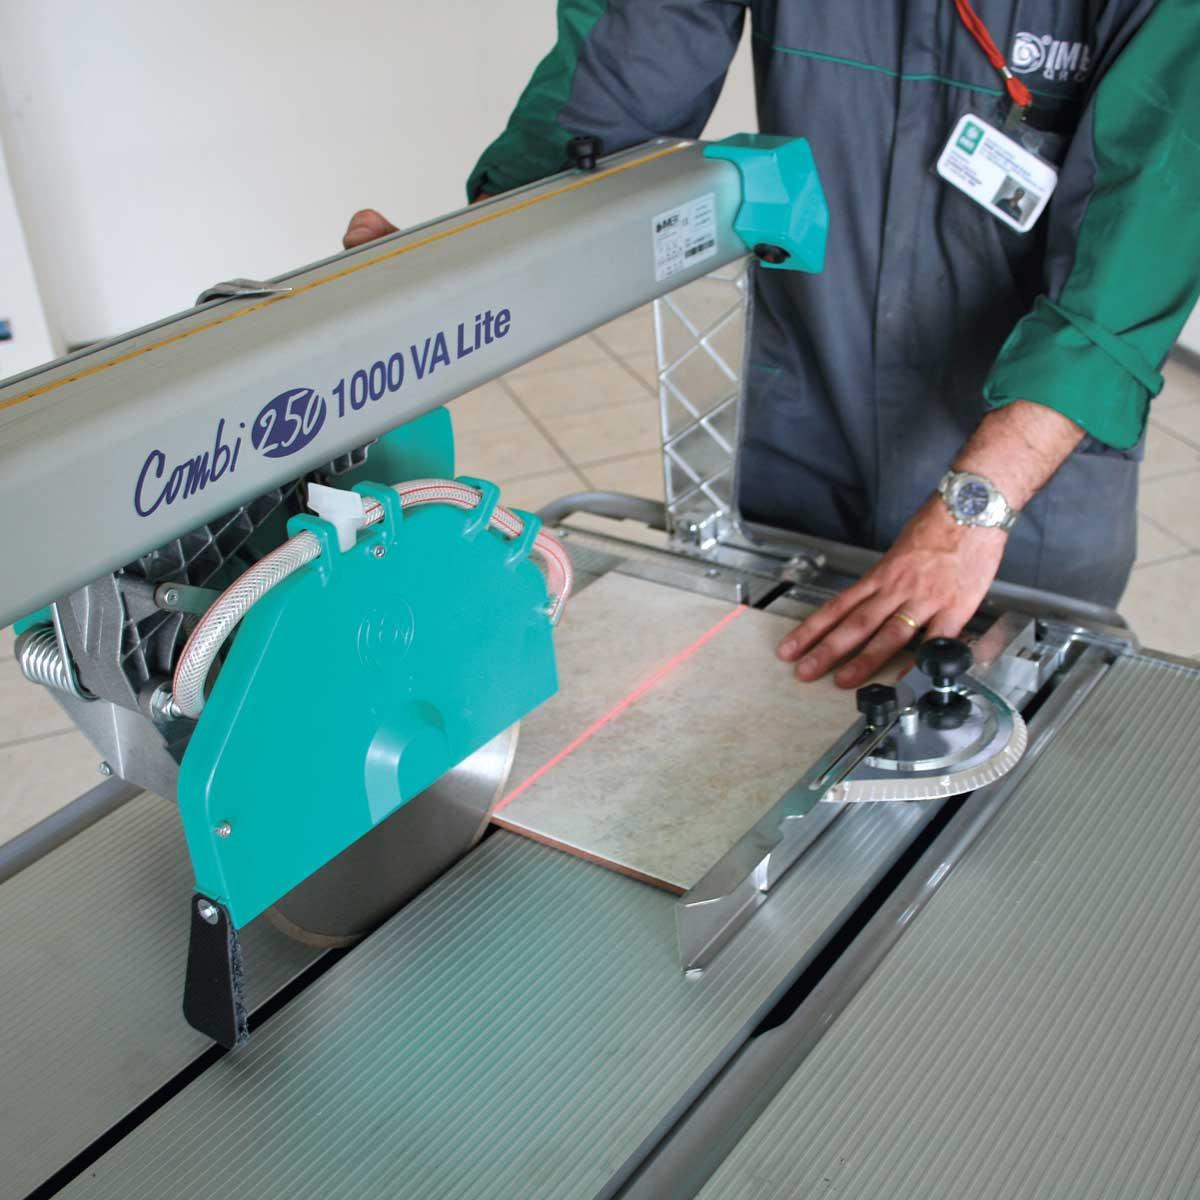 Imer Combi 250/1000VA laser cutting guide